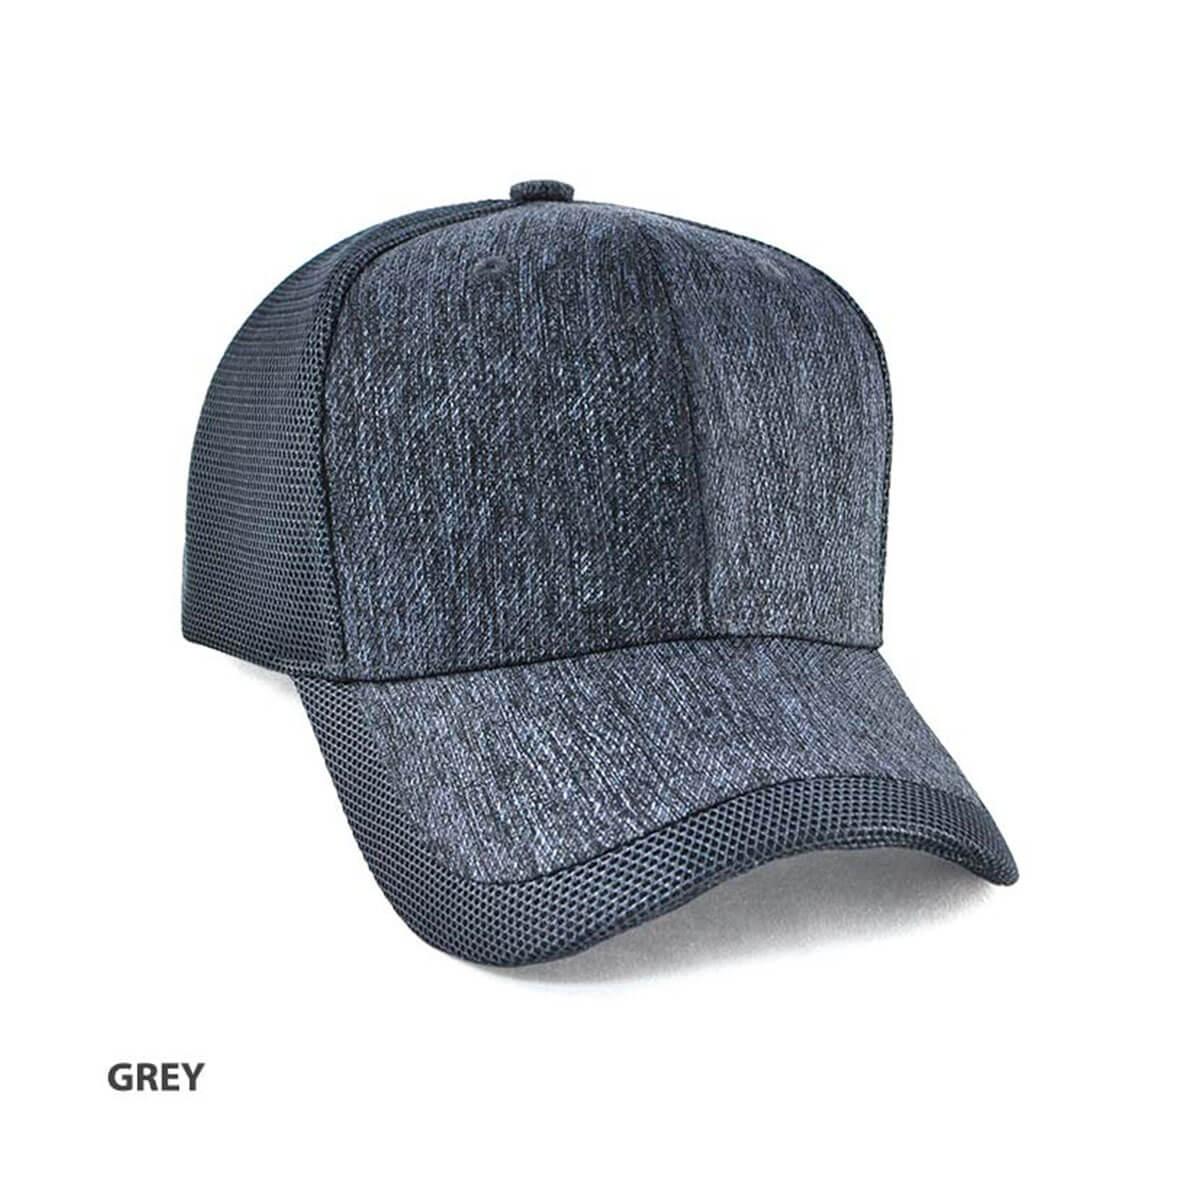 Cazamataz Cap-Grey